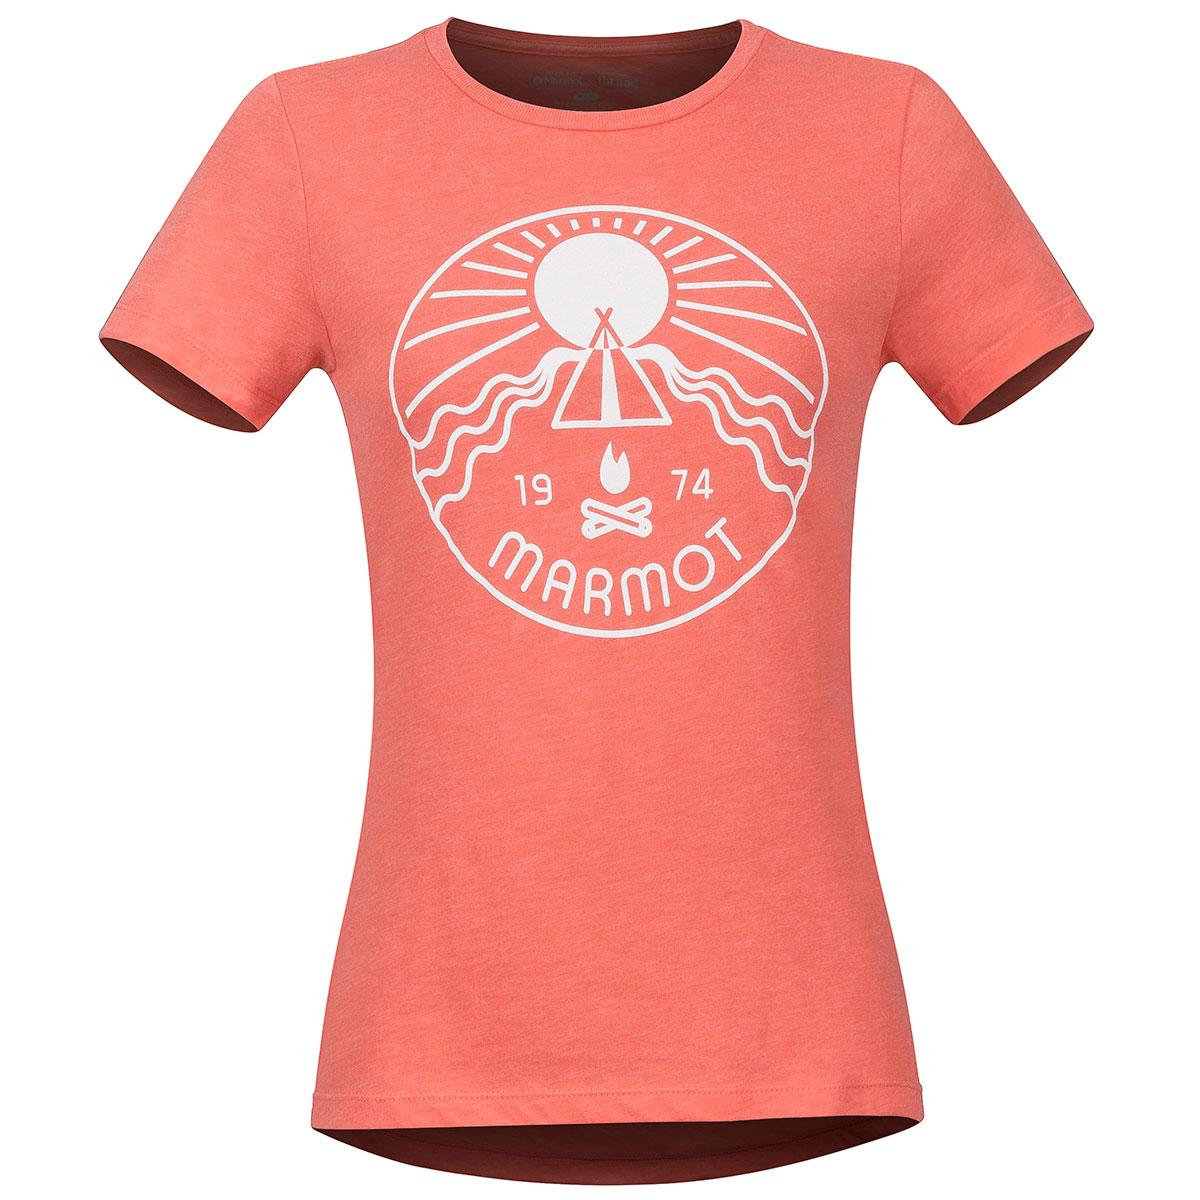 Marmot Women's Prism Short-Sleeve Tee - Orange, L